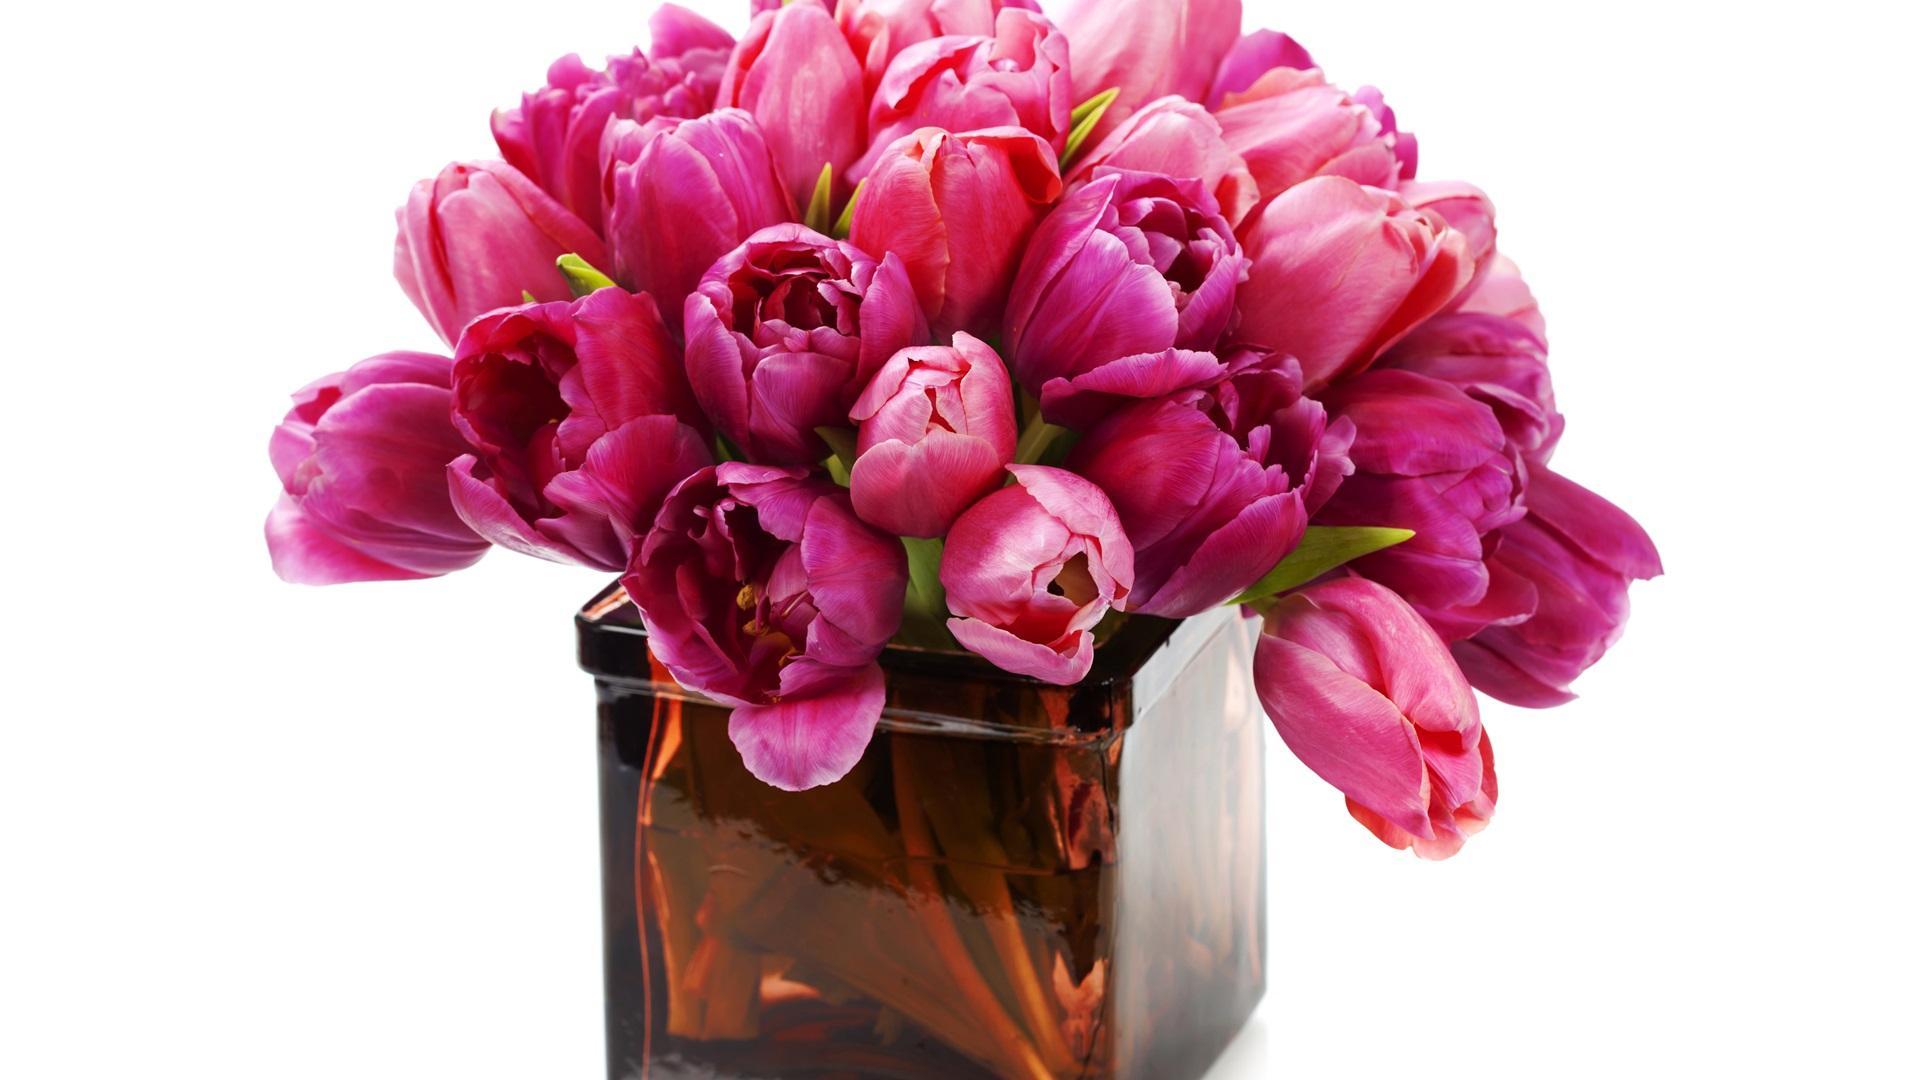 Pink tulips, vase Wallpaper | 1920x1080 Full HD resolution ... Hd Wallpaper 1920x1080 Free Download